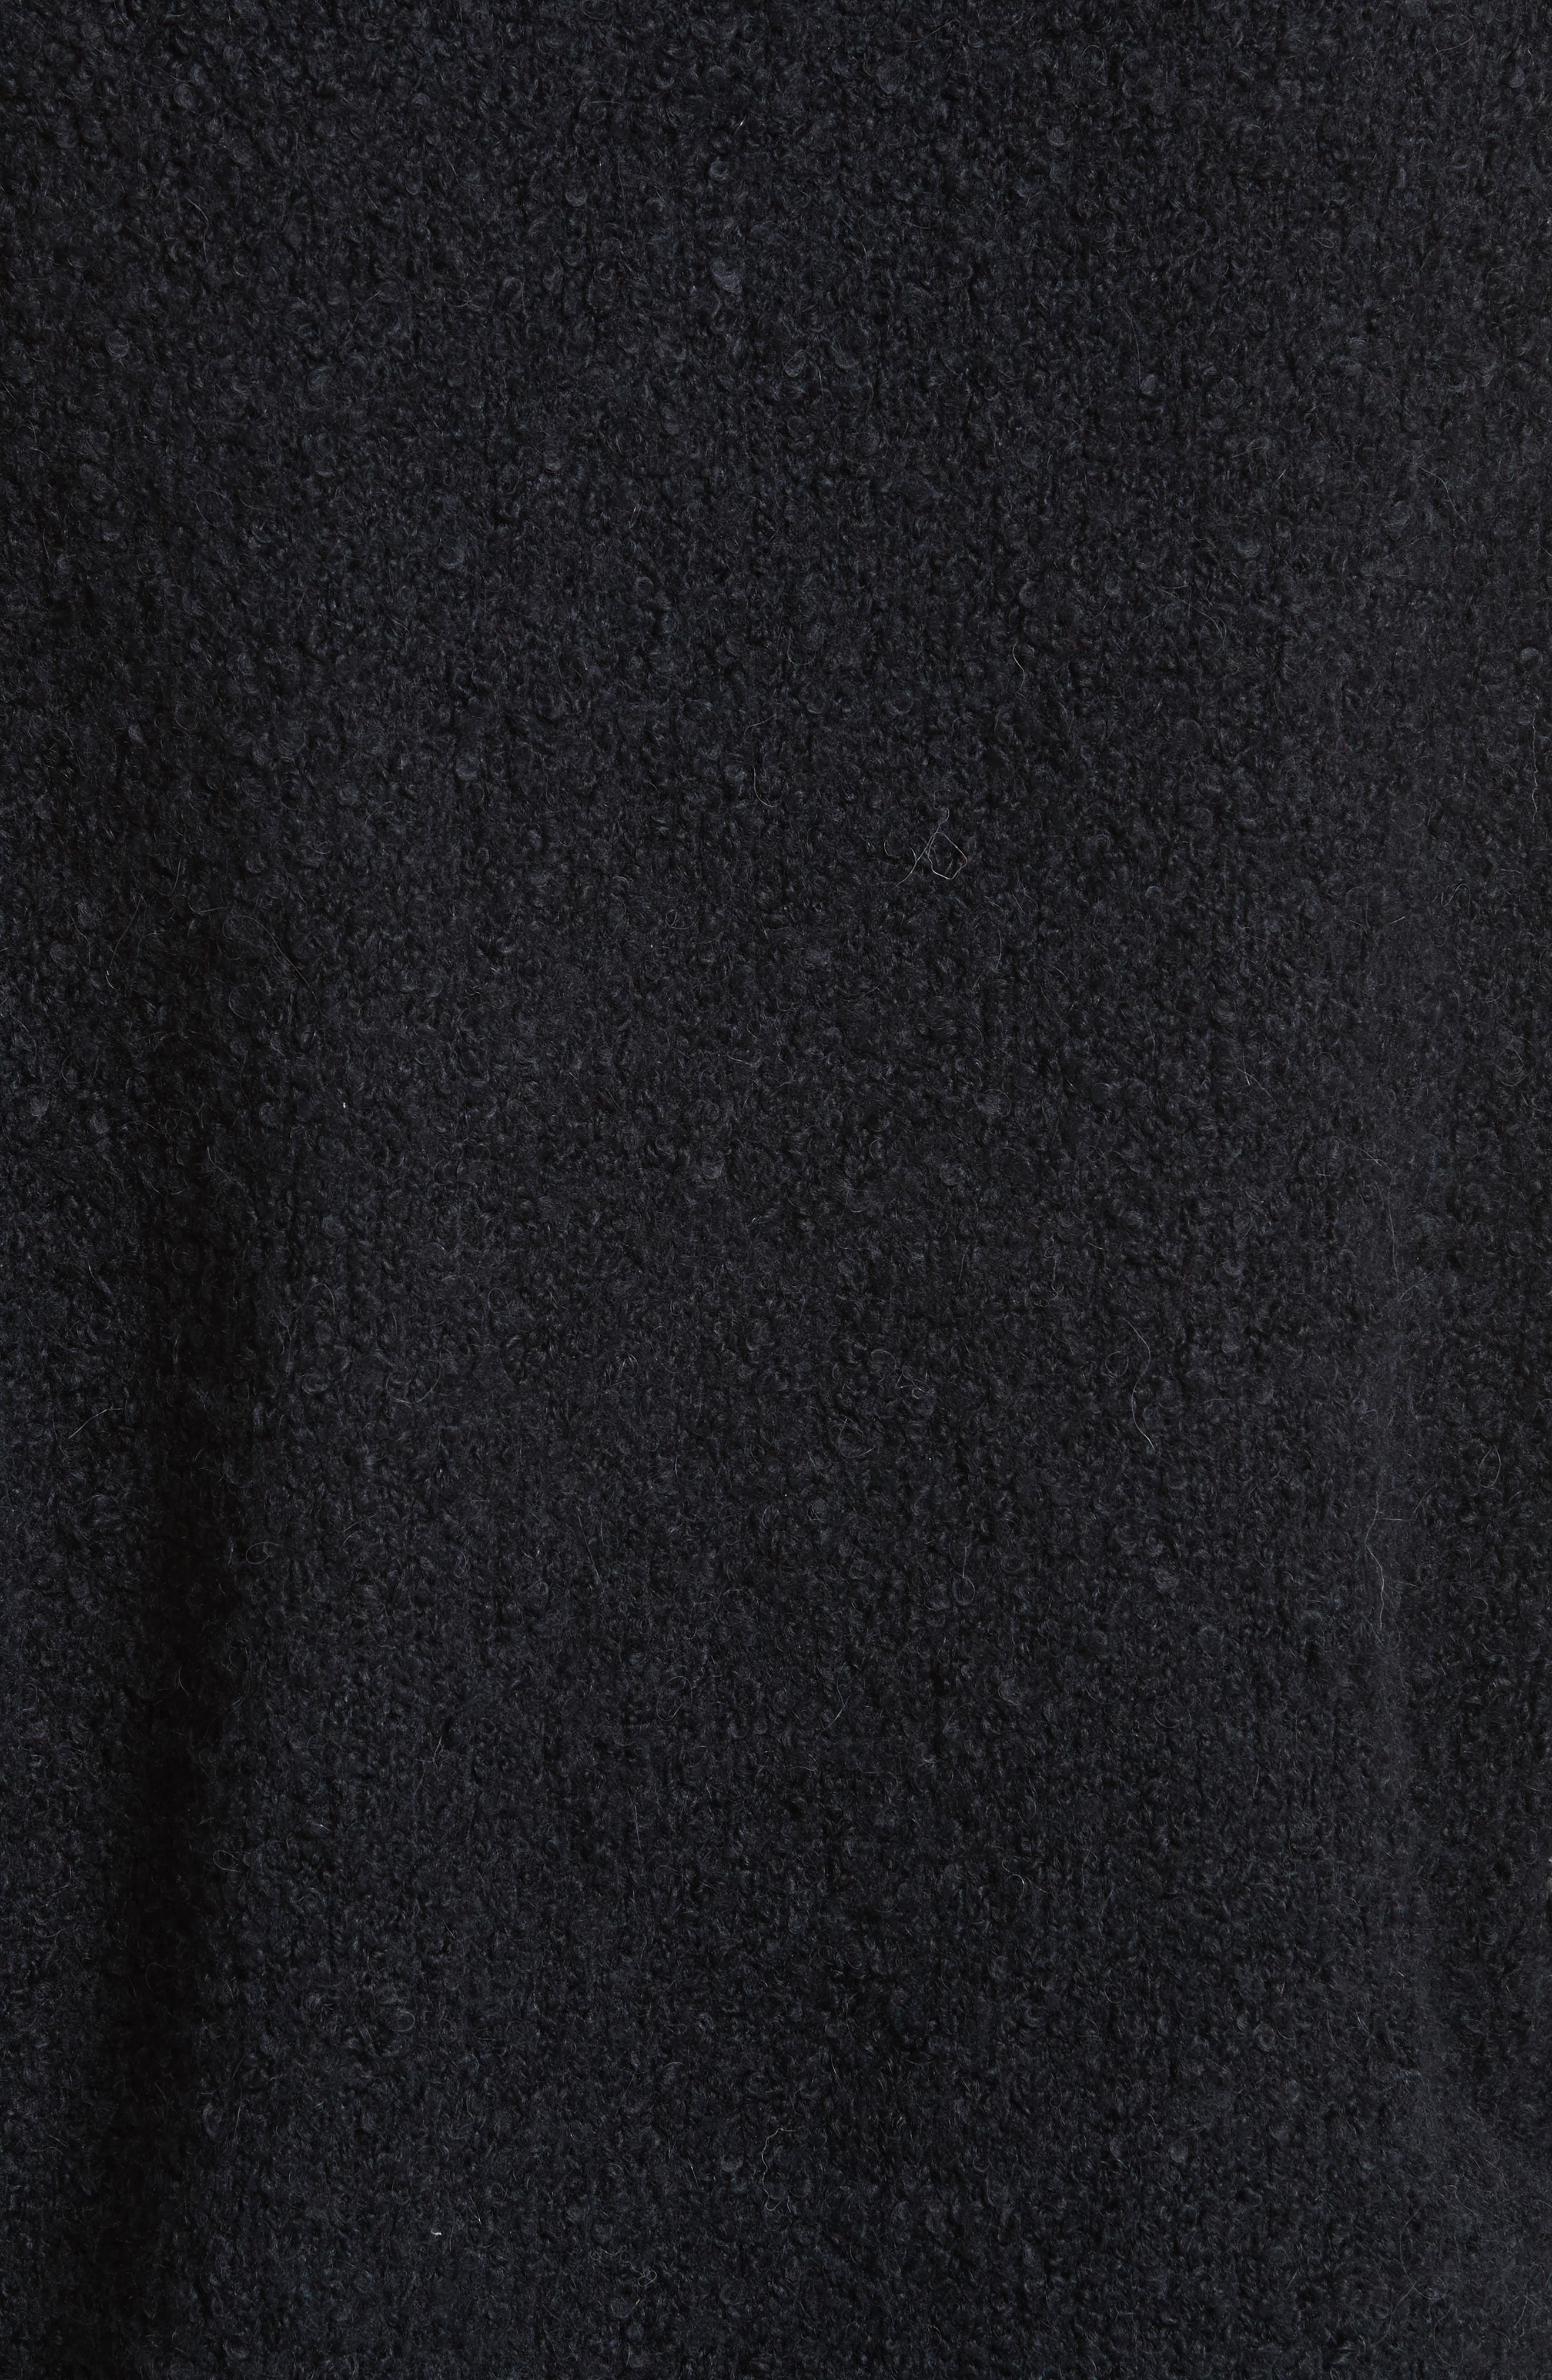 Lofty V-Neck Sweater,                             Alternate thumbnail 5, color,                             001